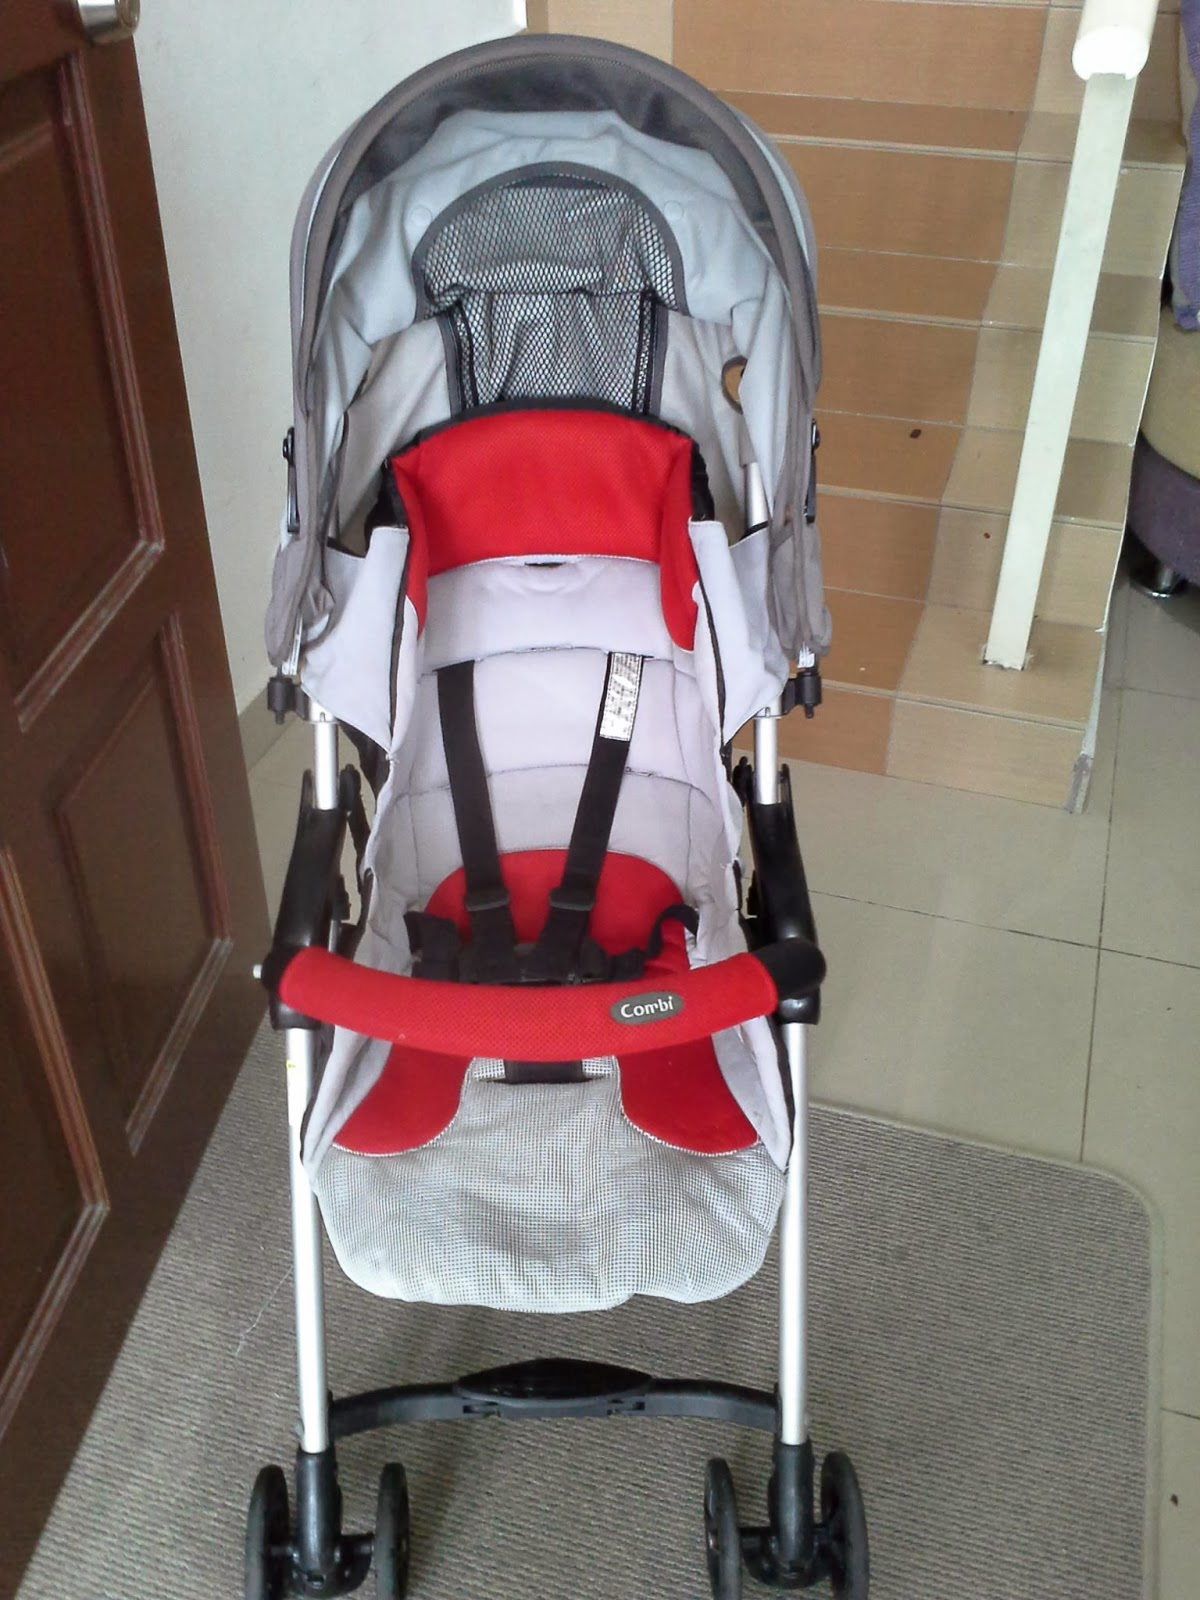 TwinkleBibi: Stroller Combi Cocot Compact